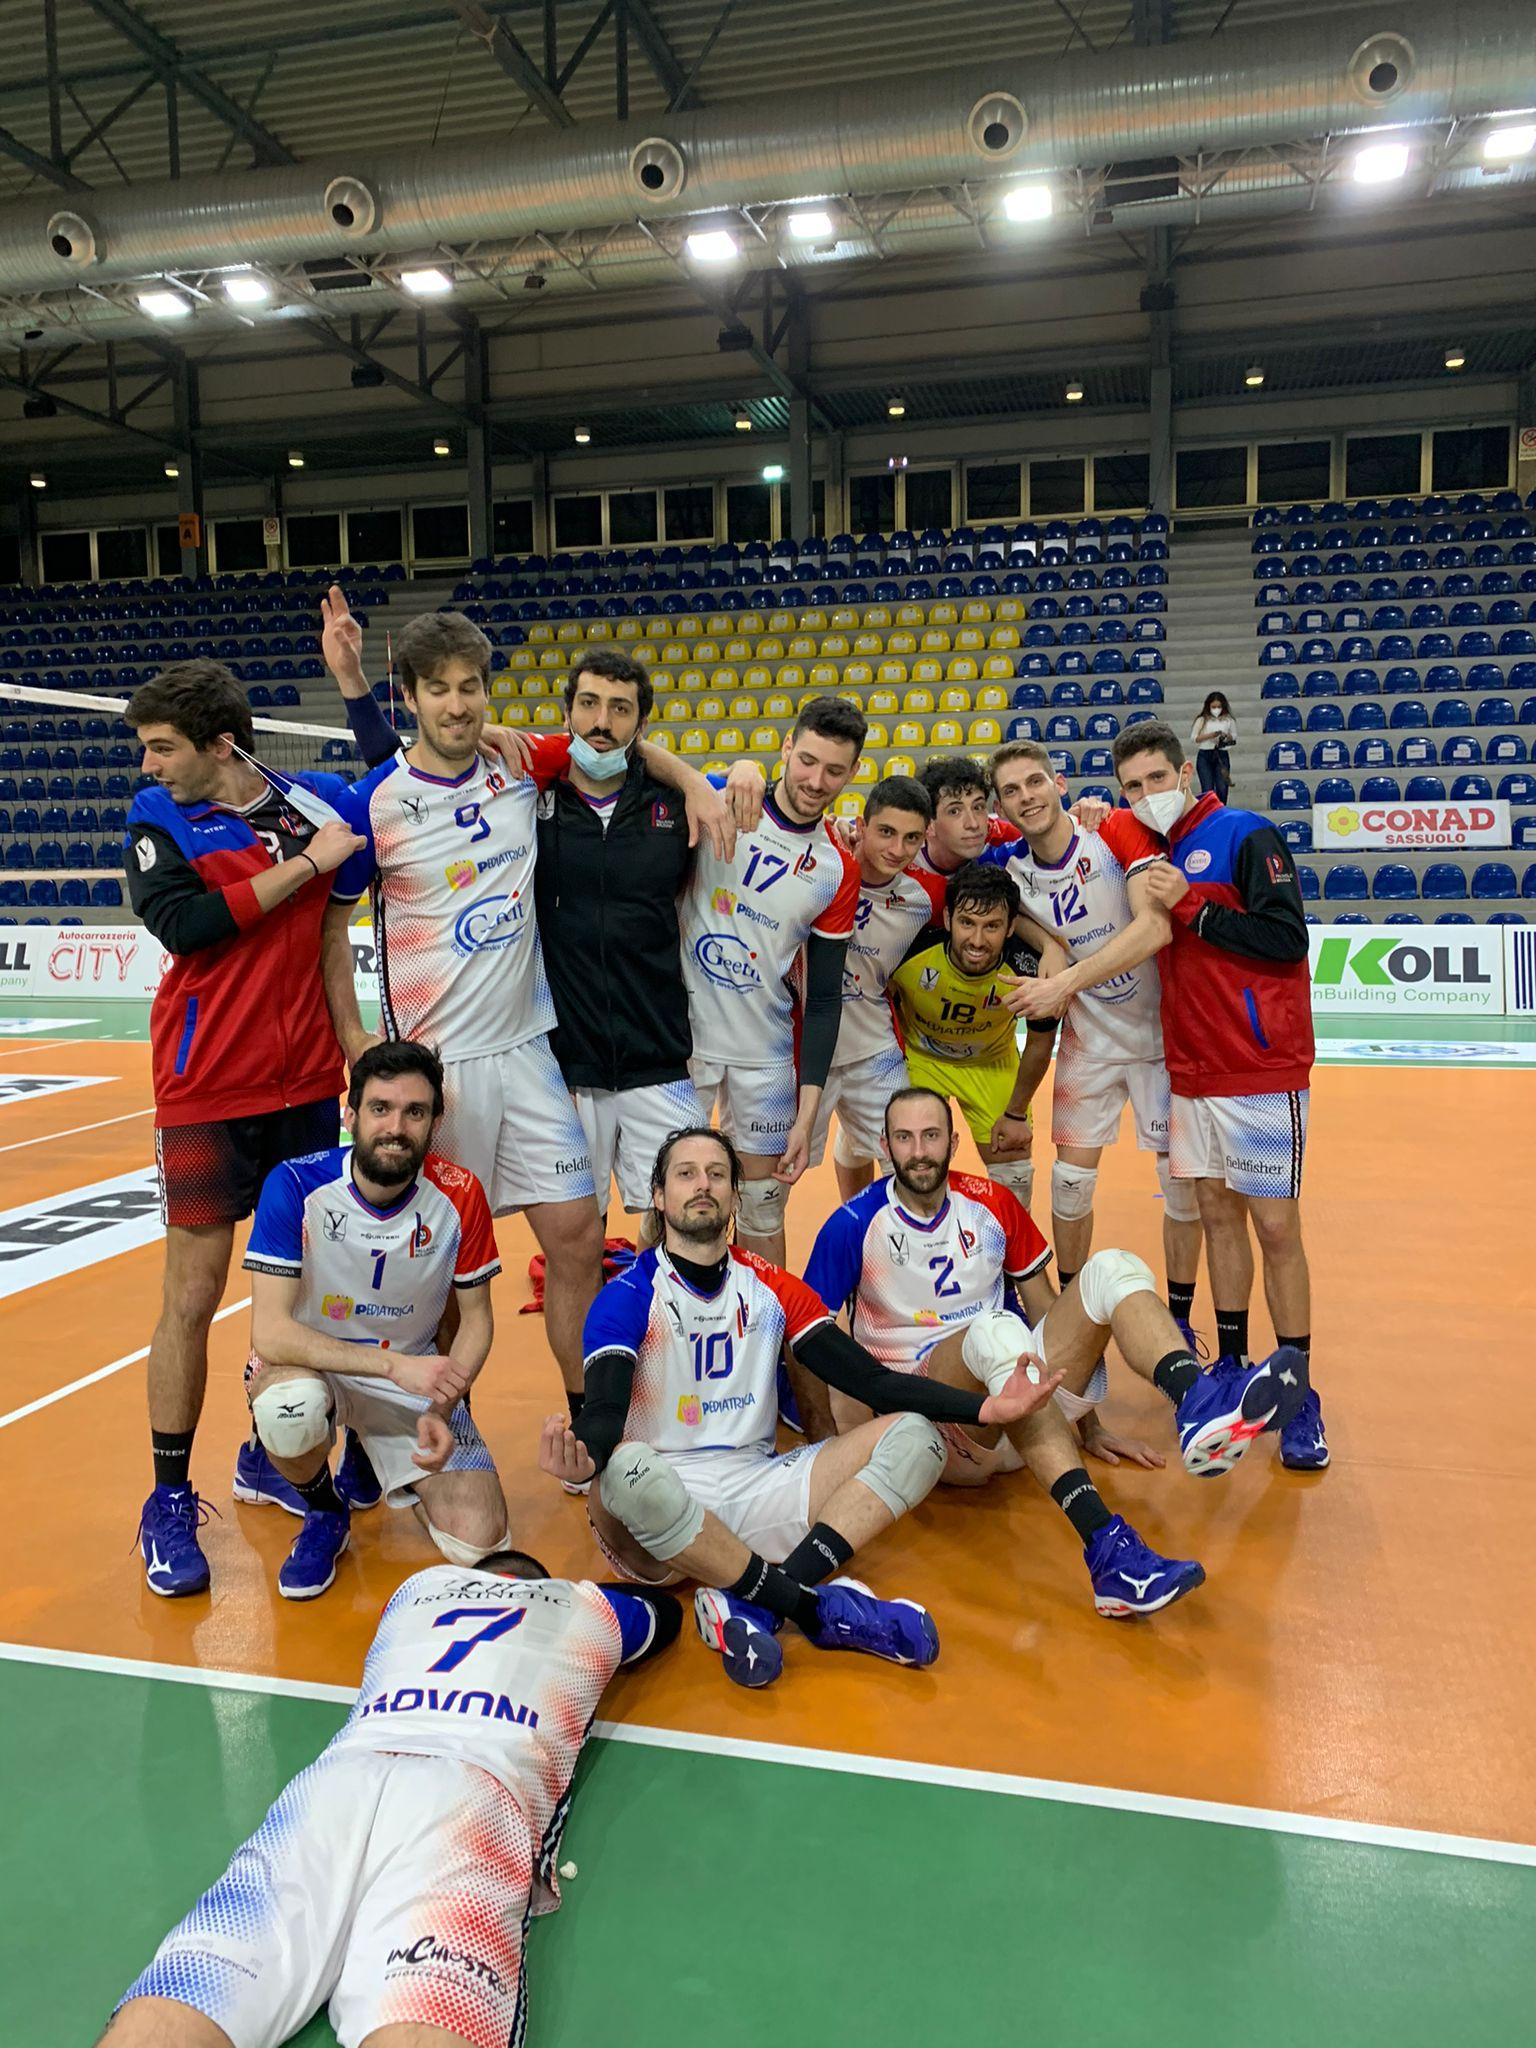 Ultimo match di regular season: Sassuolo-Geetit Bologna